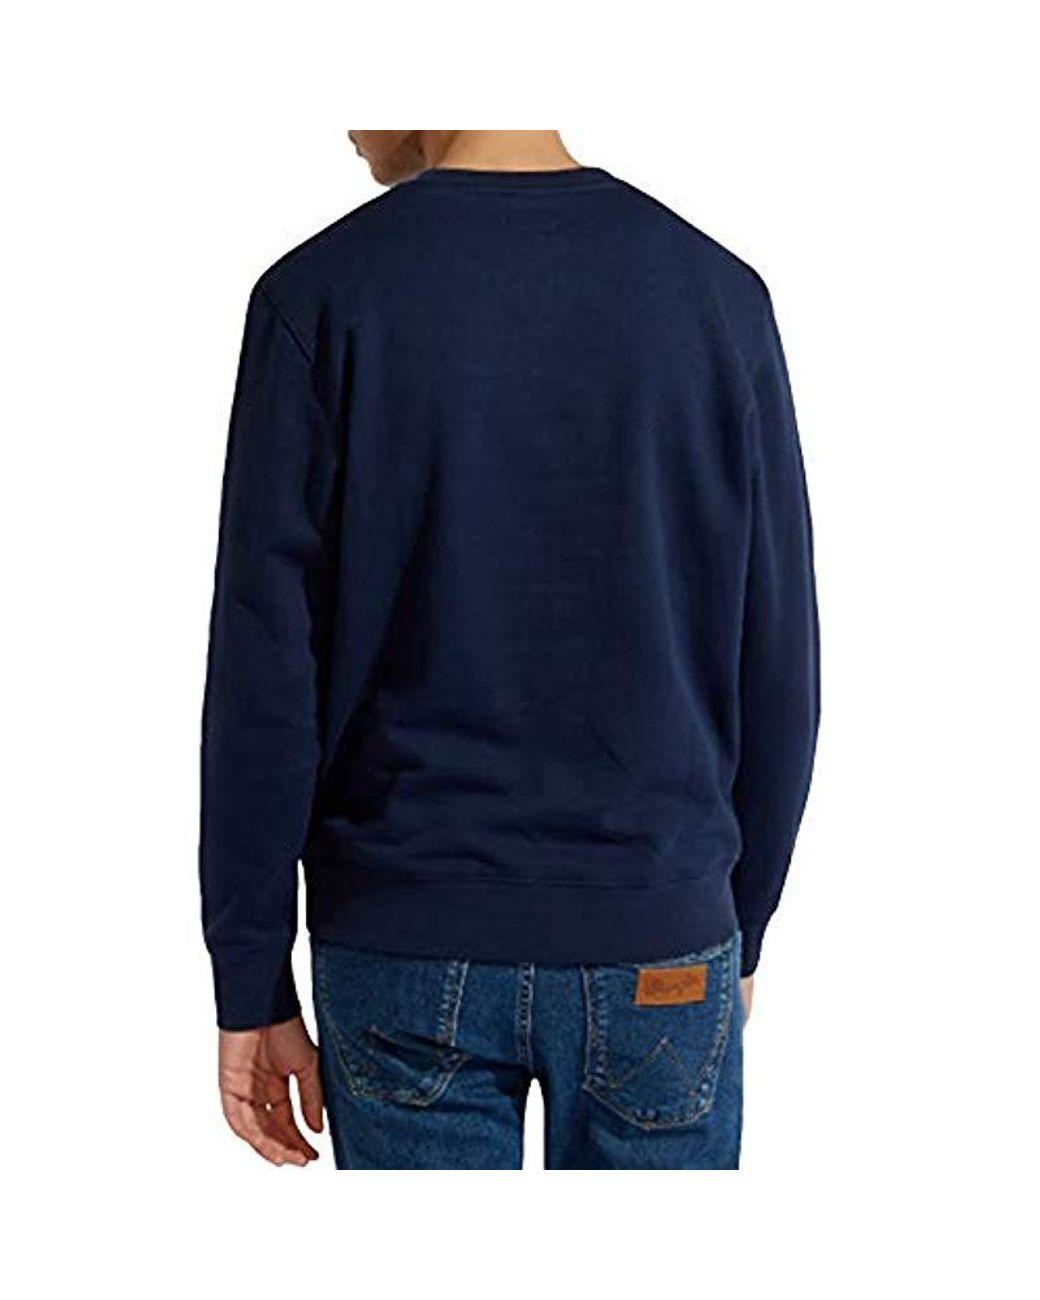 Wrangler Mens Wnc Crew Sweatshirt